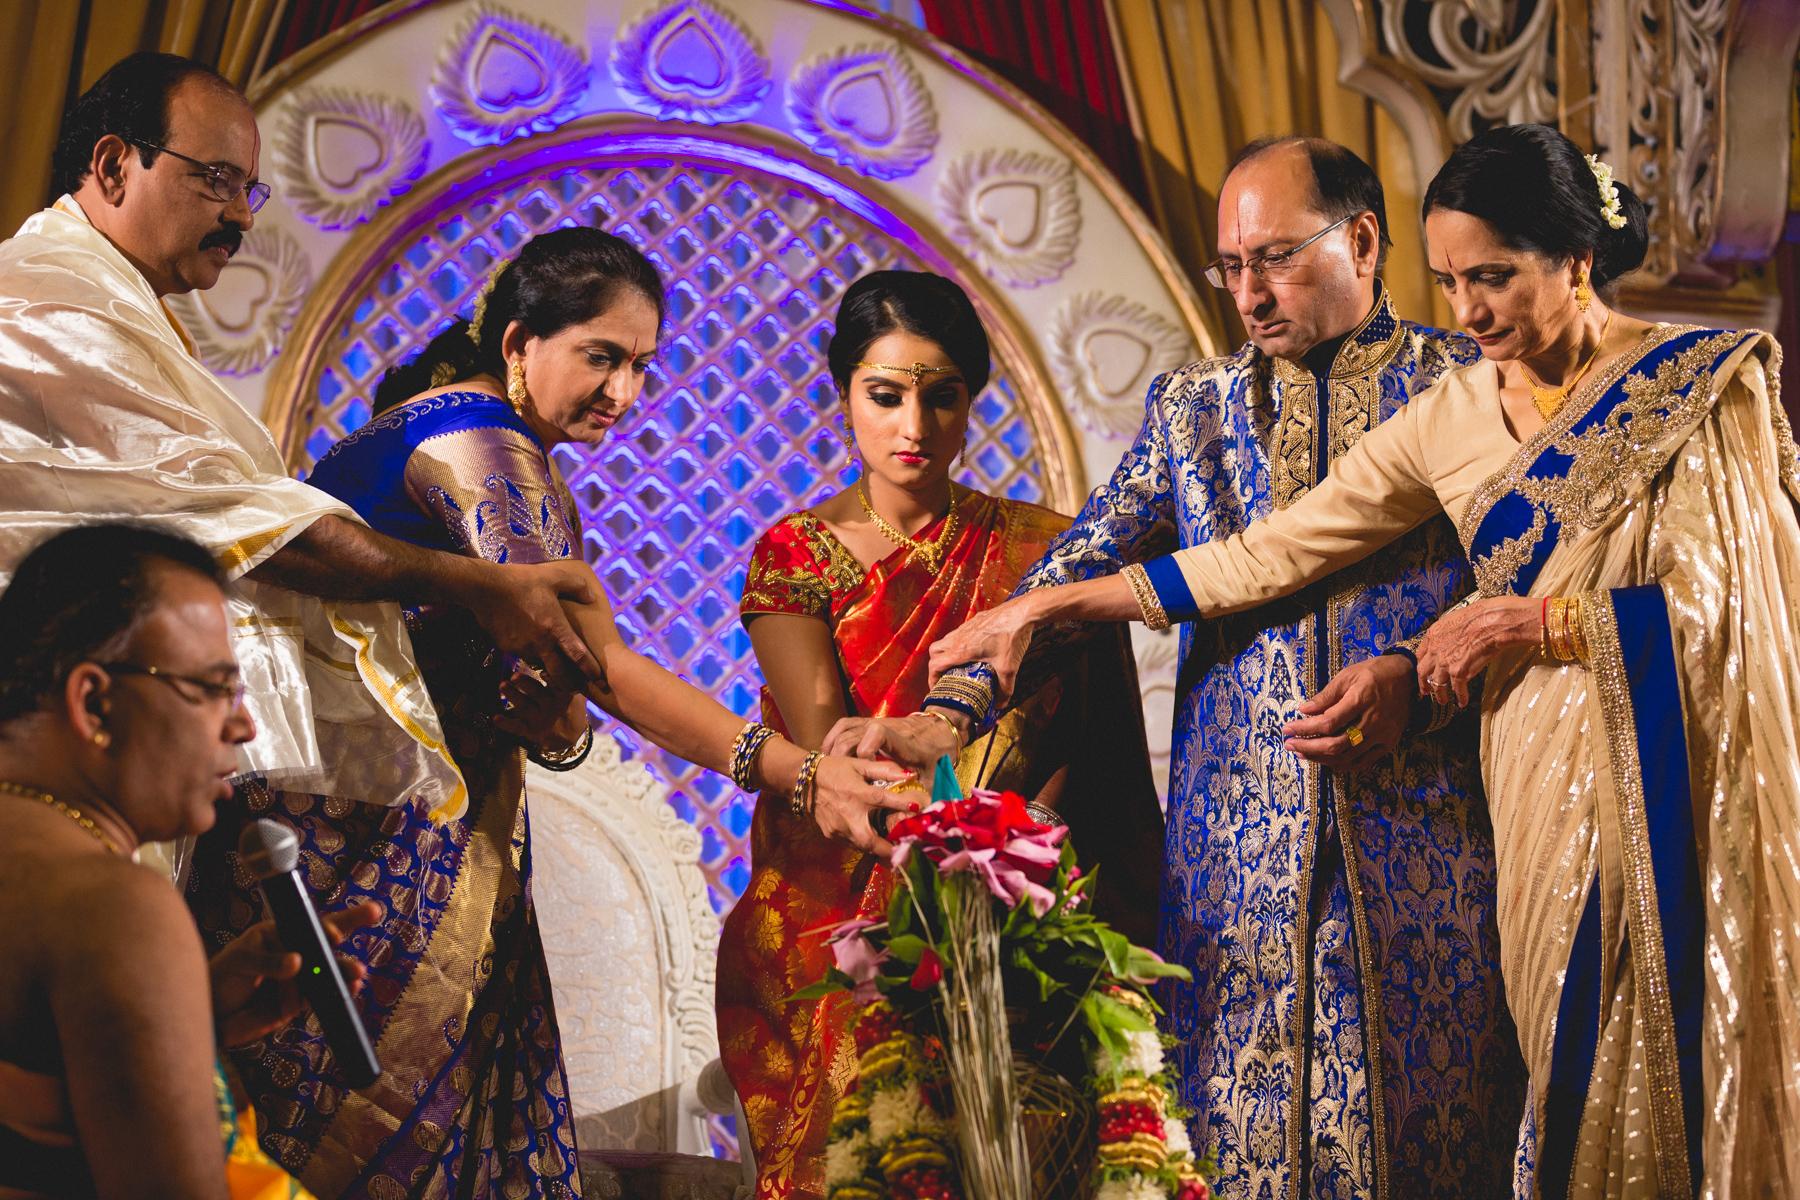 edward-b-photography-indian-wedding-27.jpg